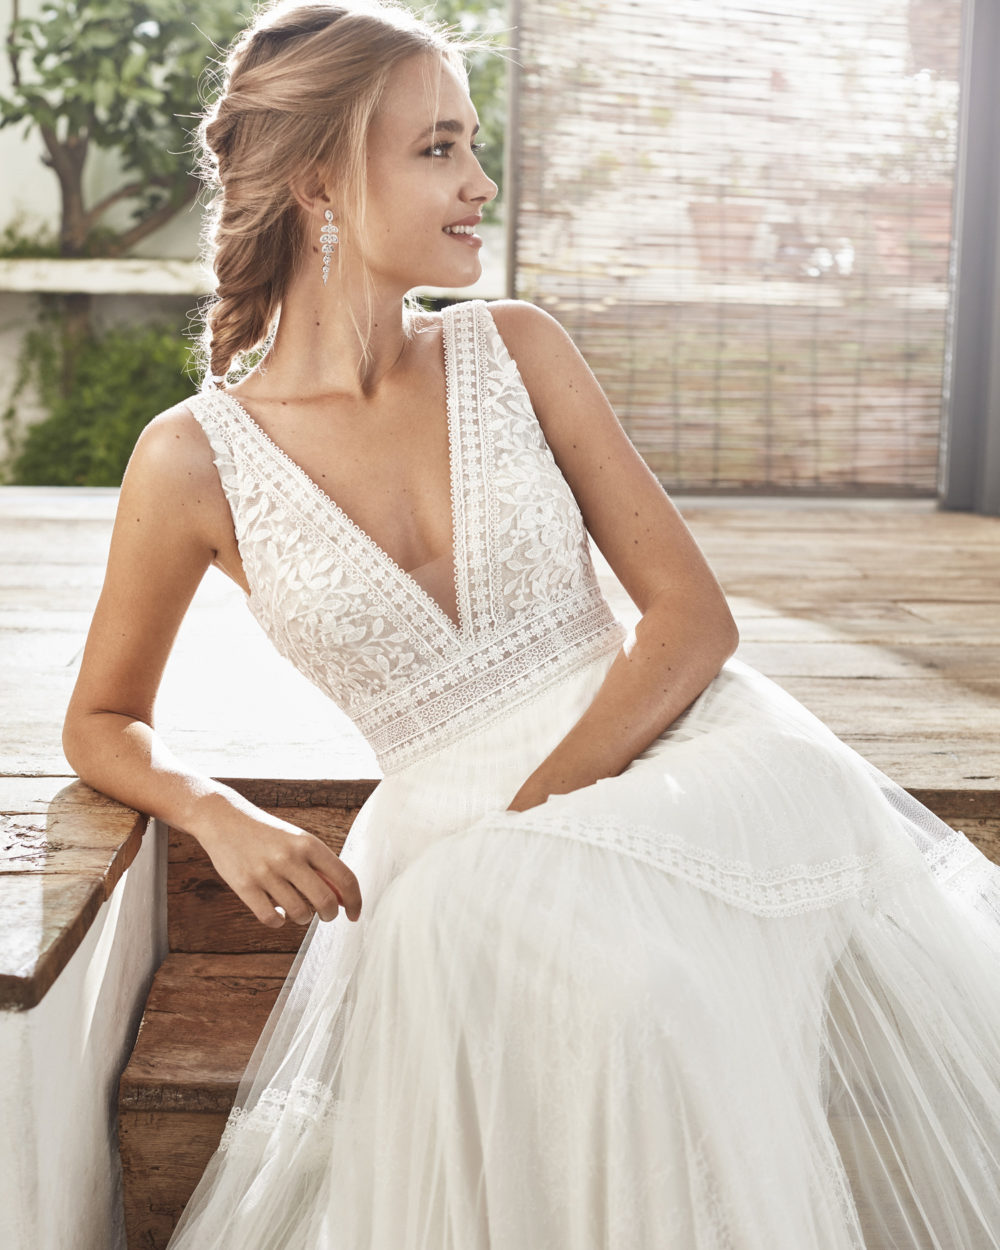 Mariages: abito da sposa Rosa Clarà 2020 a Vicenza, Verona, Padova, Veneto 4A118 CAMI